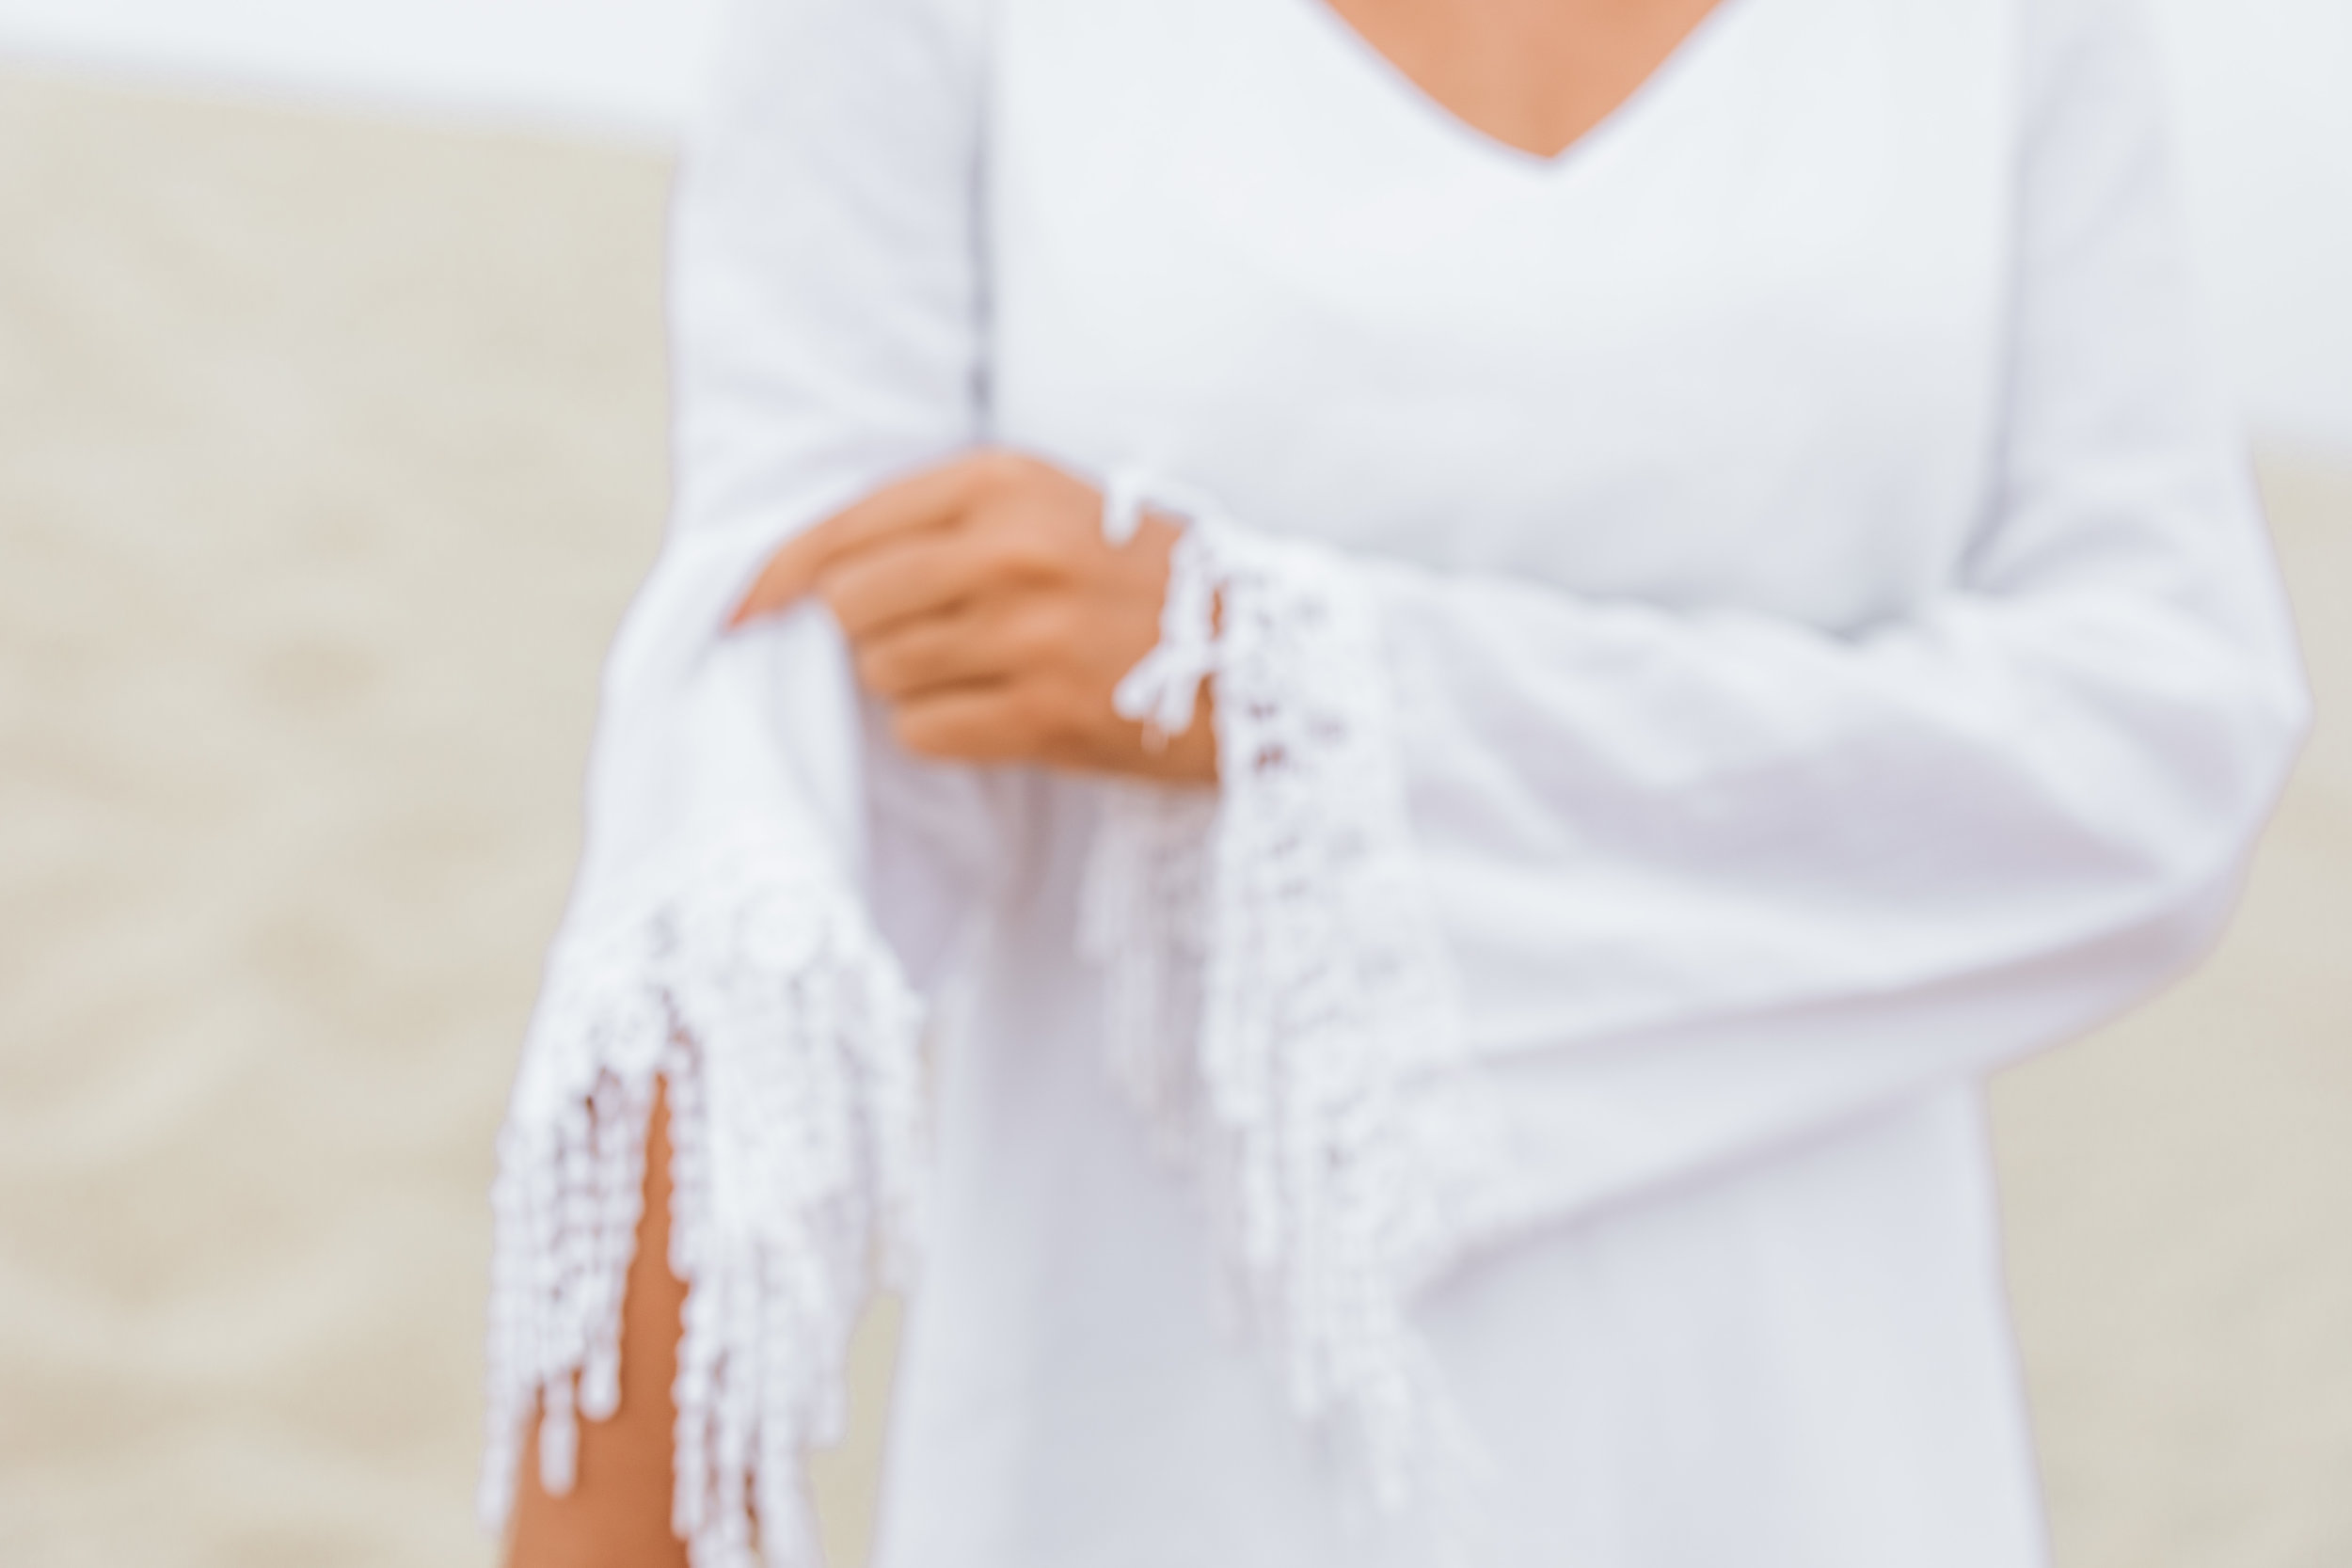 huacachina-peru-honeymoon-elopement-destination-wedding-photography-michael-cozzens-31.jpg